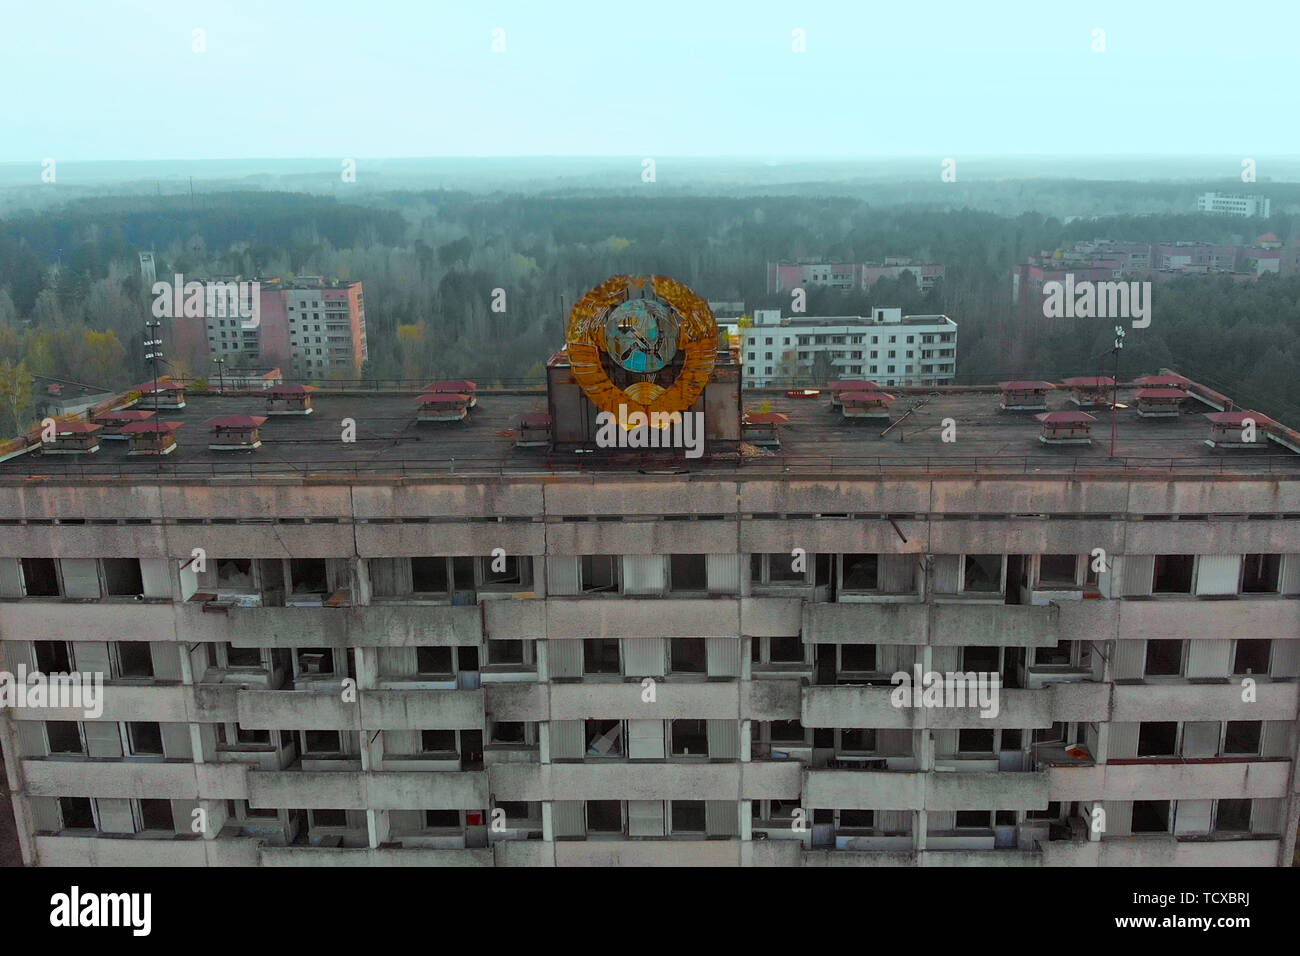 Ghost town Pripyat near Chernobyl NPP, Ukraine - Stock Image